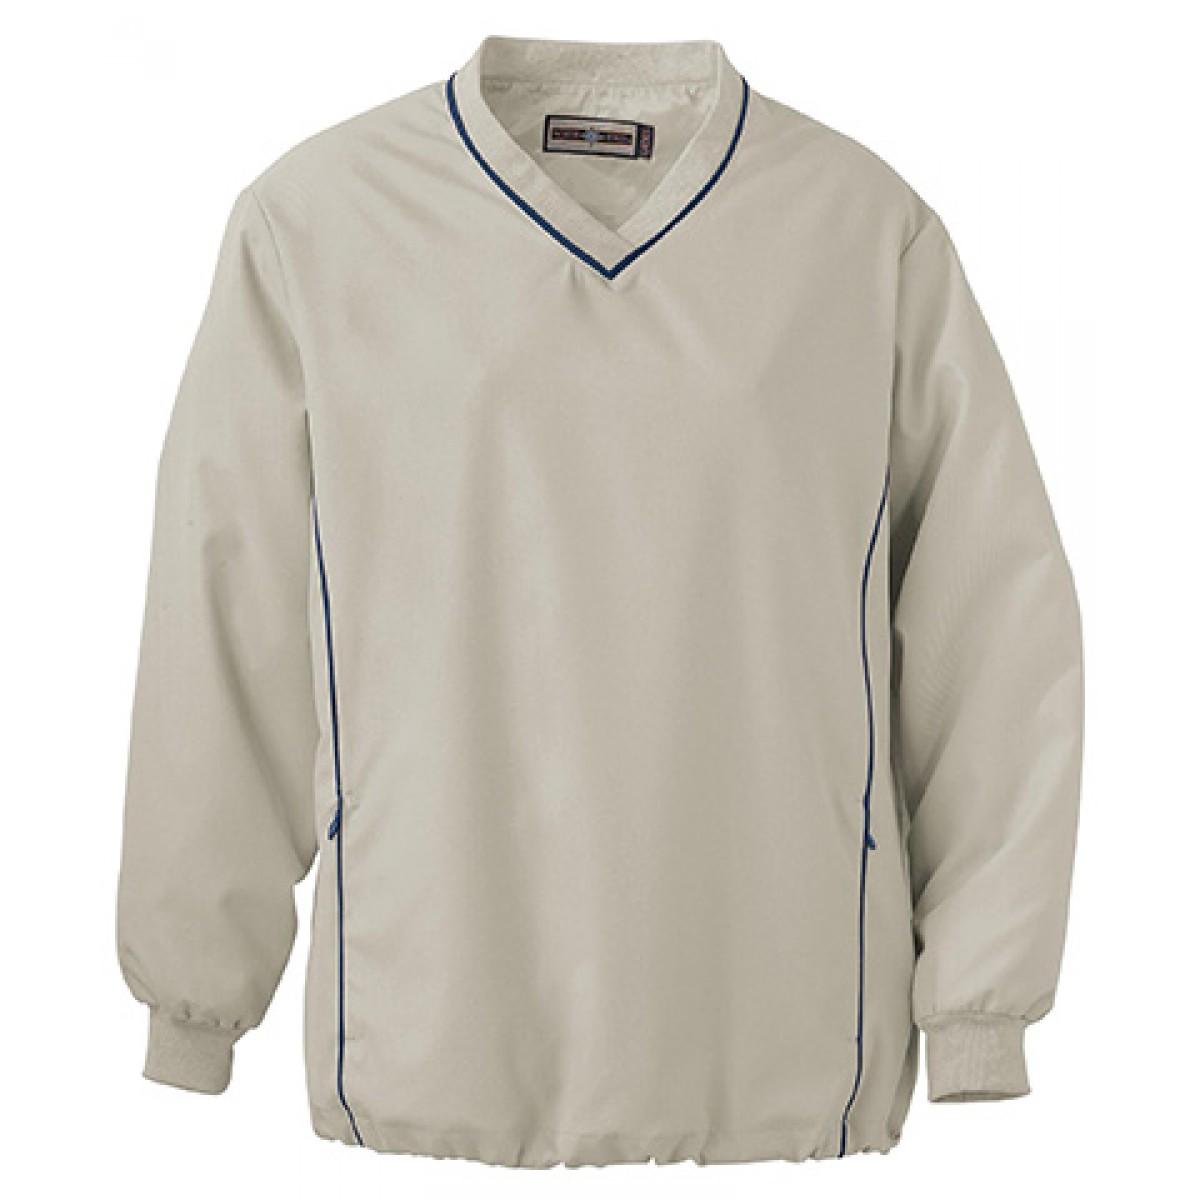 Ladies' MICRO Plus Windshirt -Putty-XL